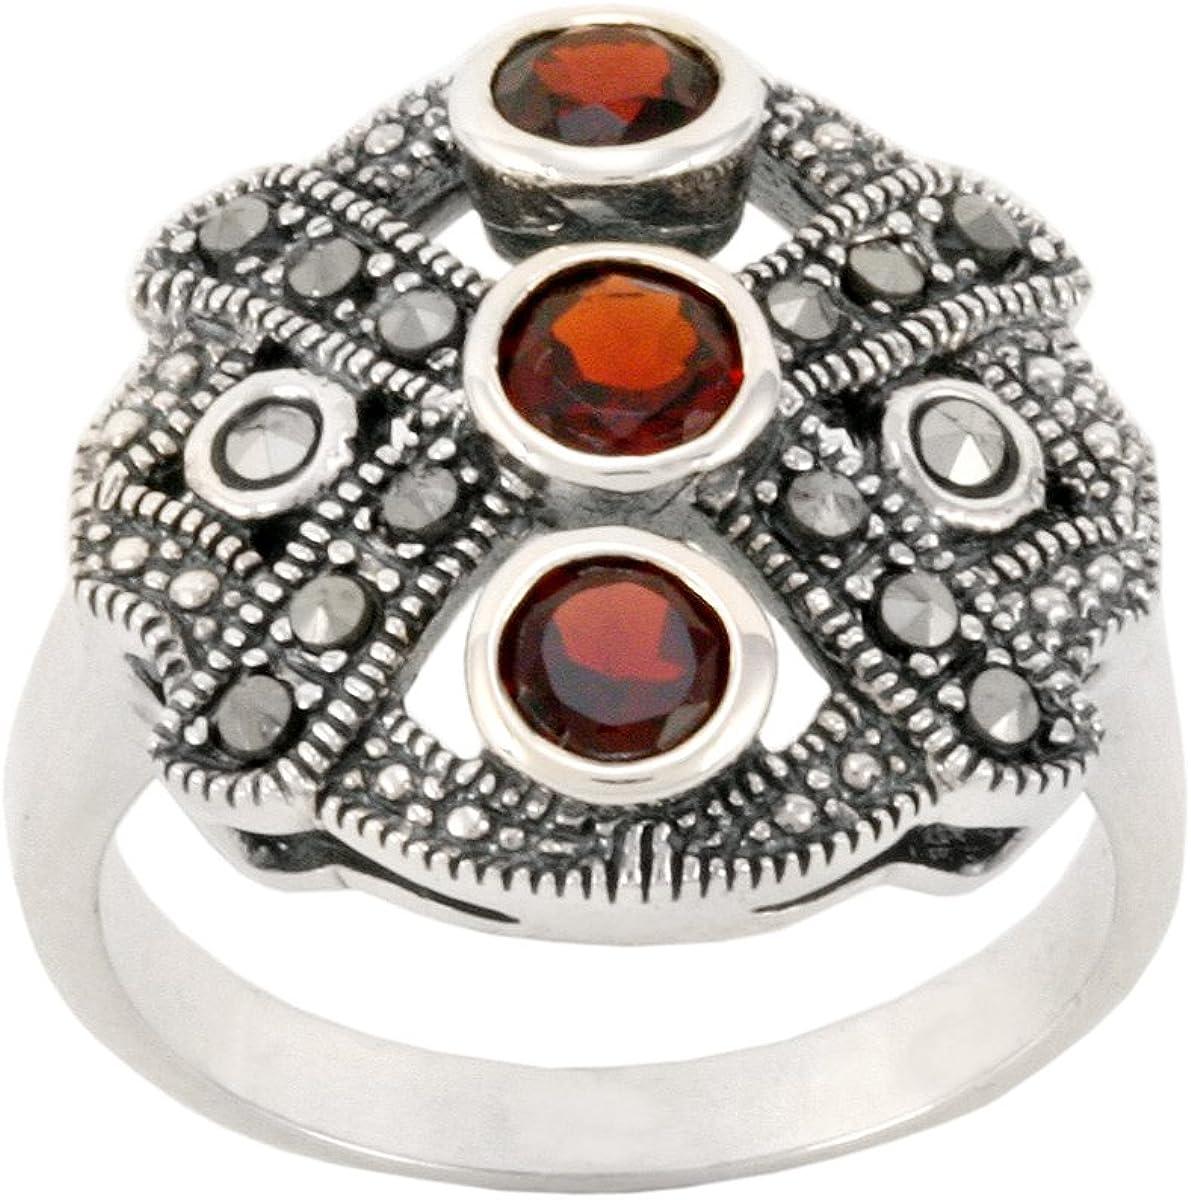 Super Nice Sterling Silver Size 10 Cut Red Corundum Stone Ring